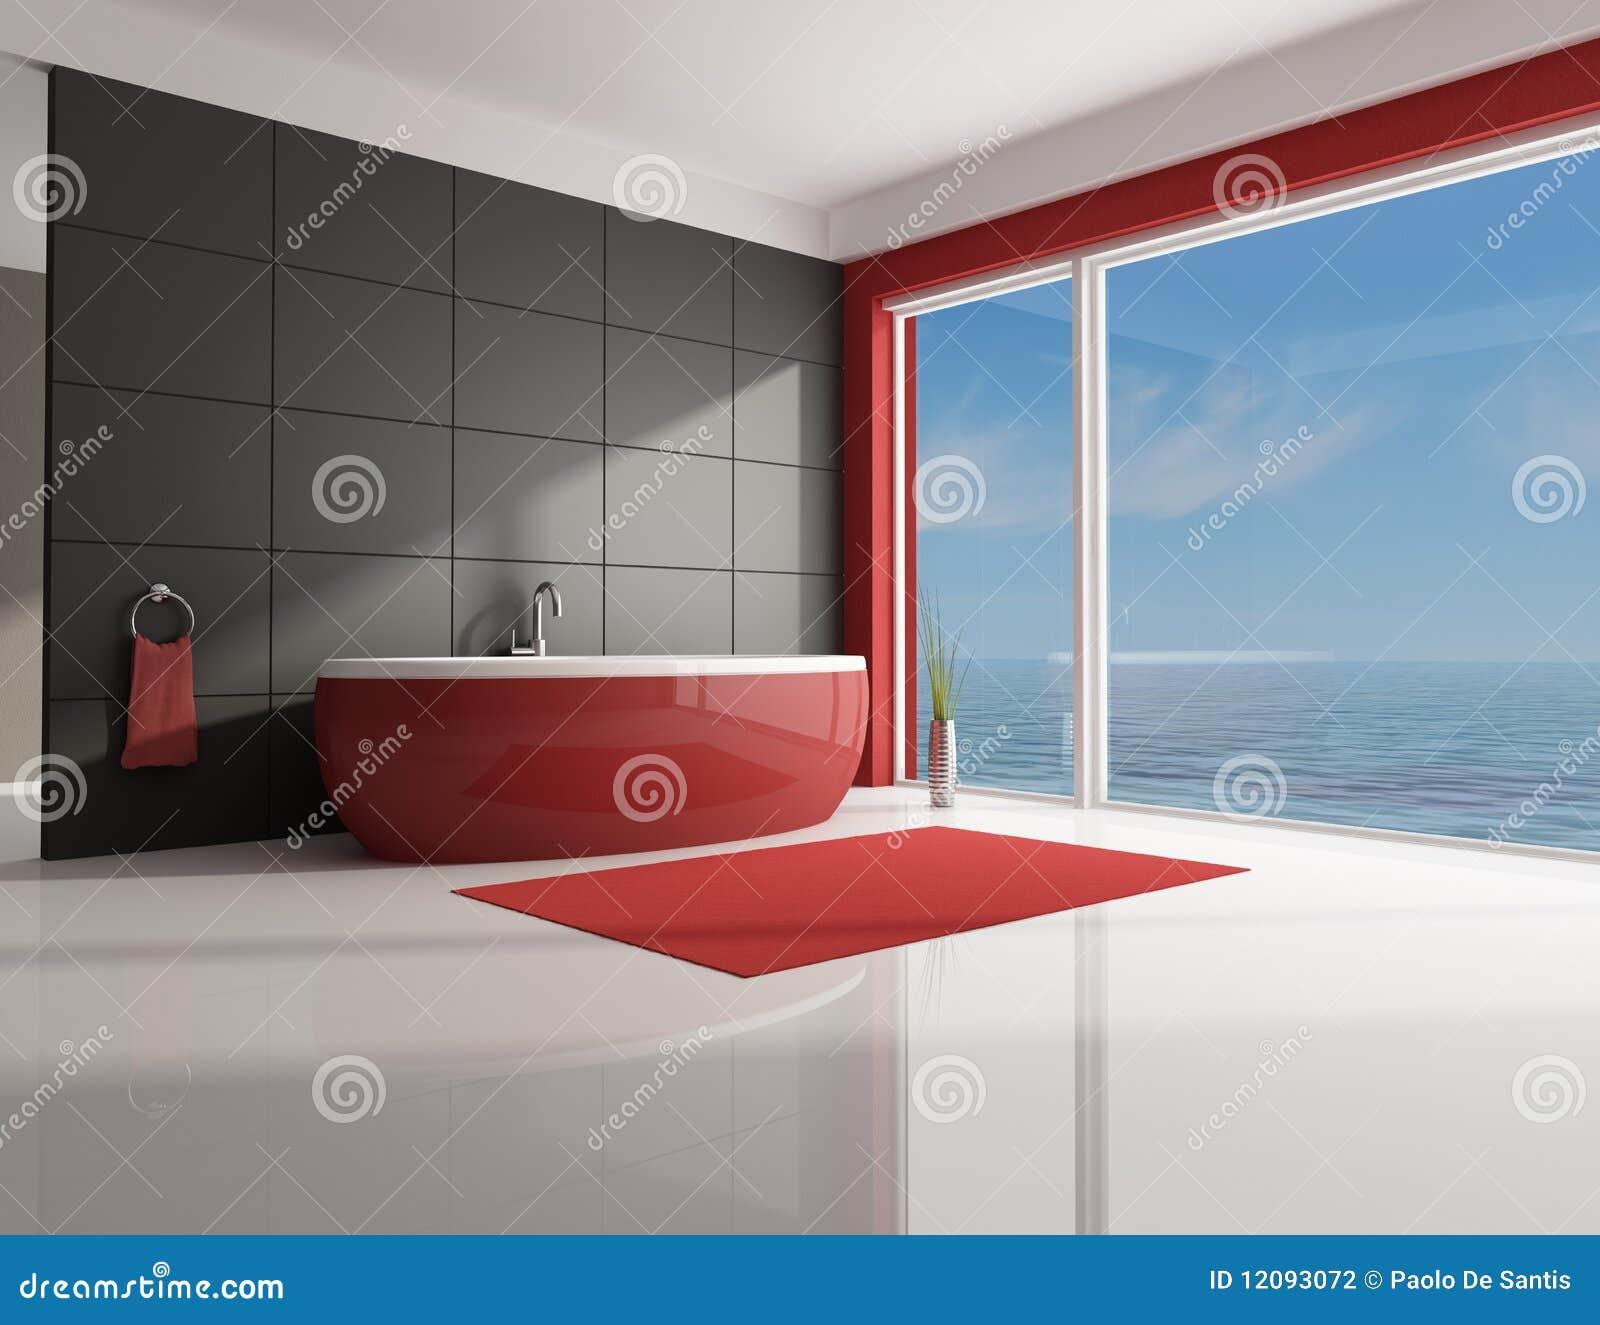 Baño Minimalista Rojo:Red and Brown Bathroom